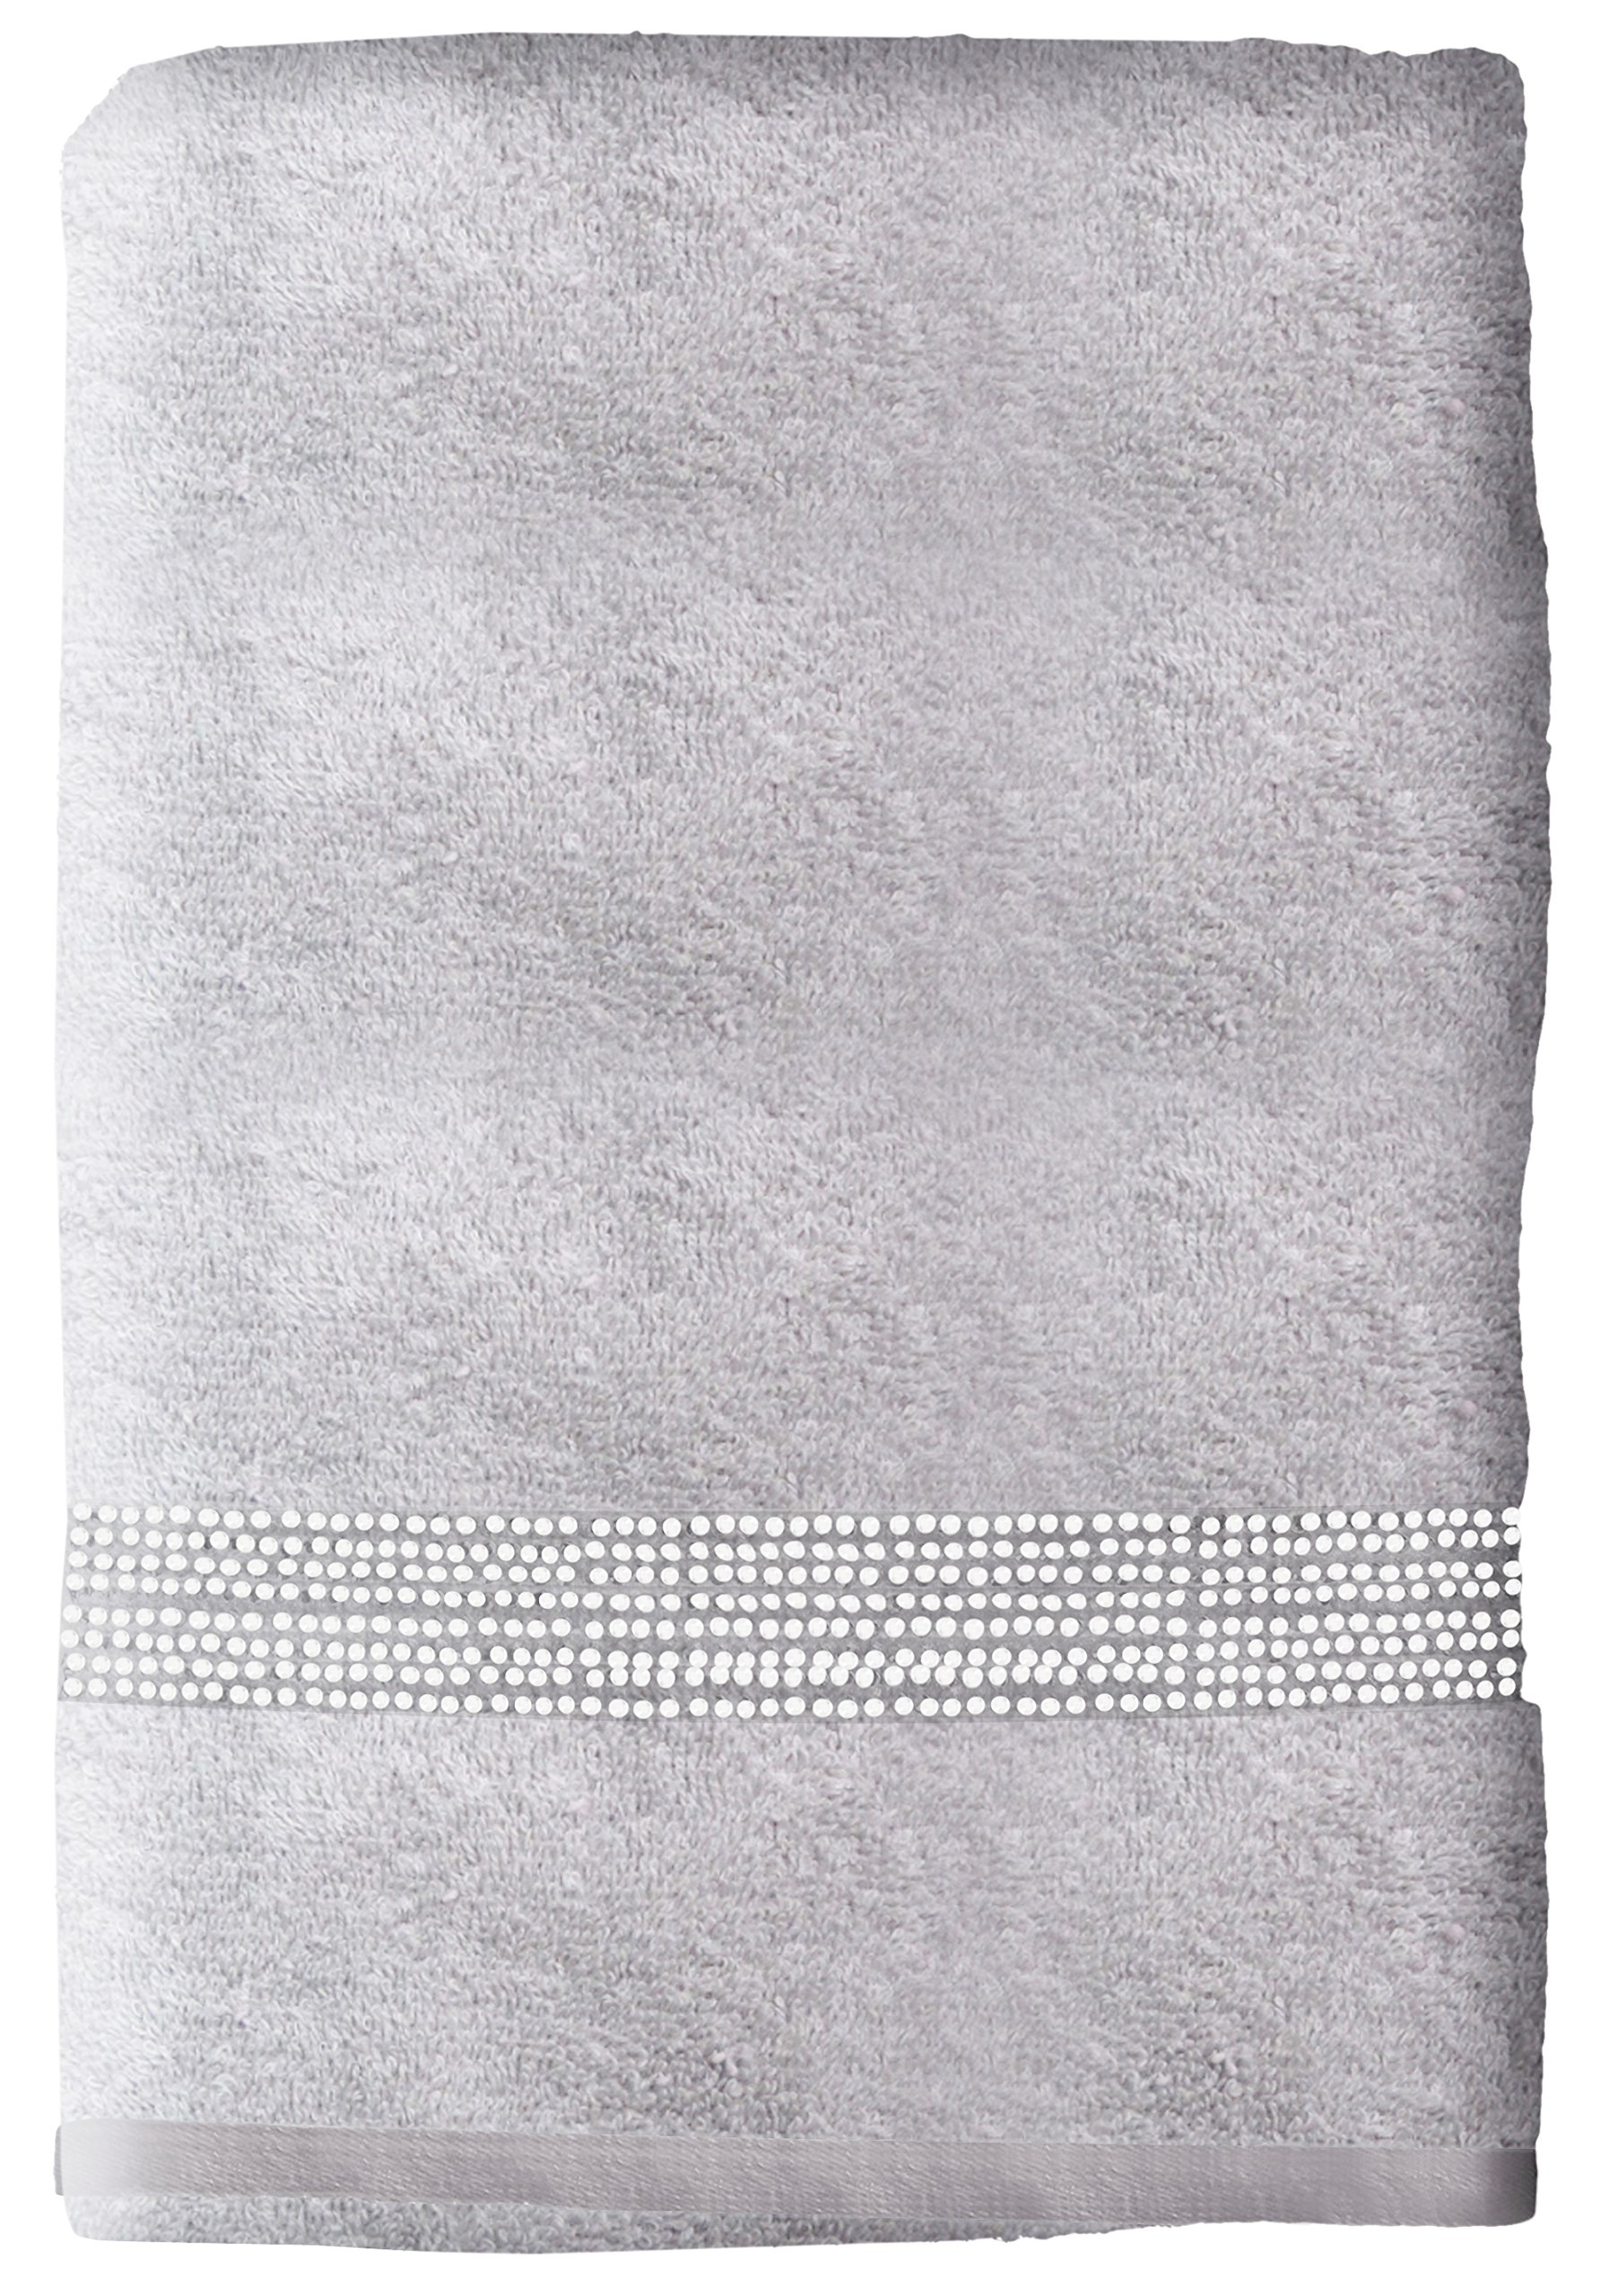 Sparkles Home S-3686-Gray Rhinestone Stripe Bath Towel, Gray